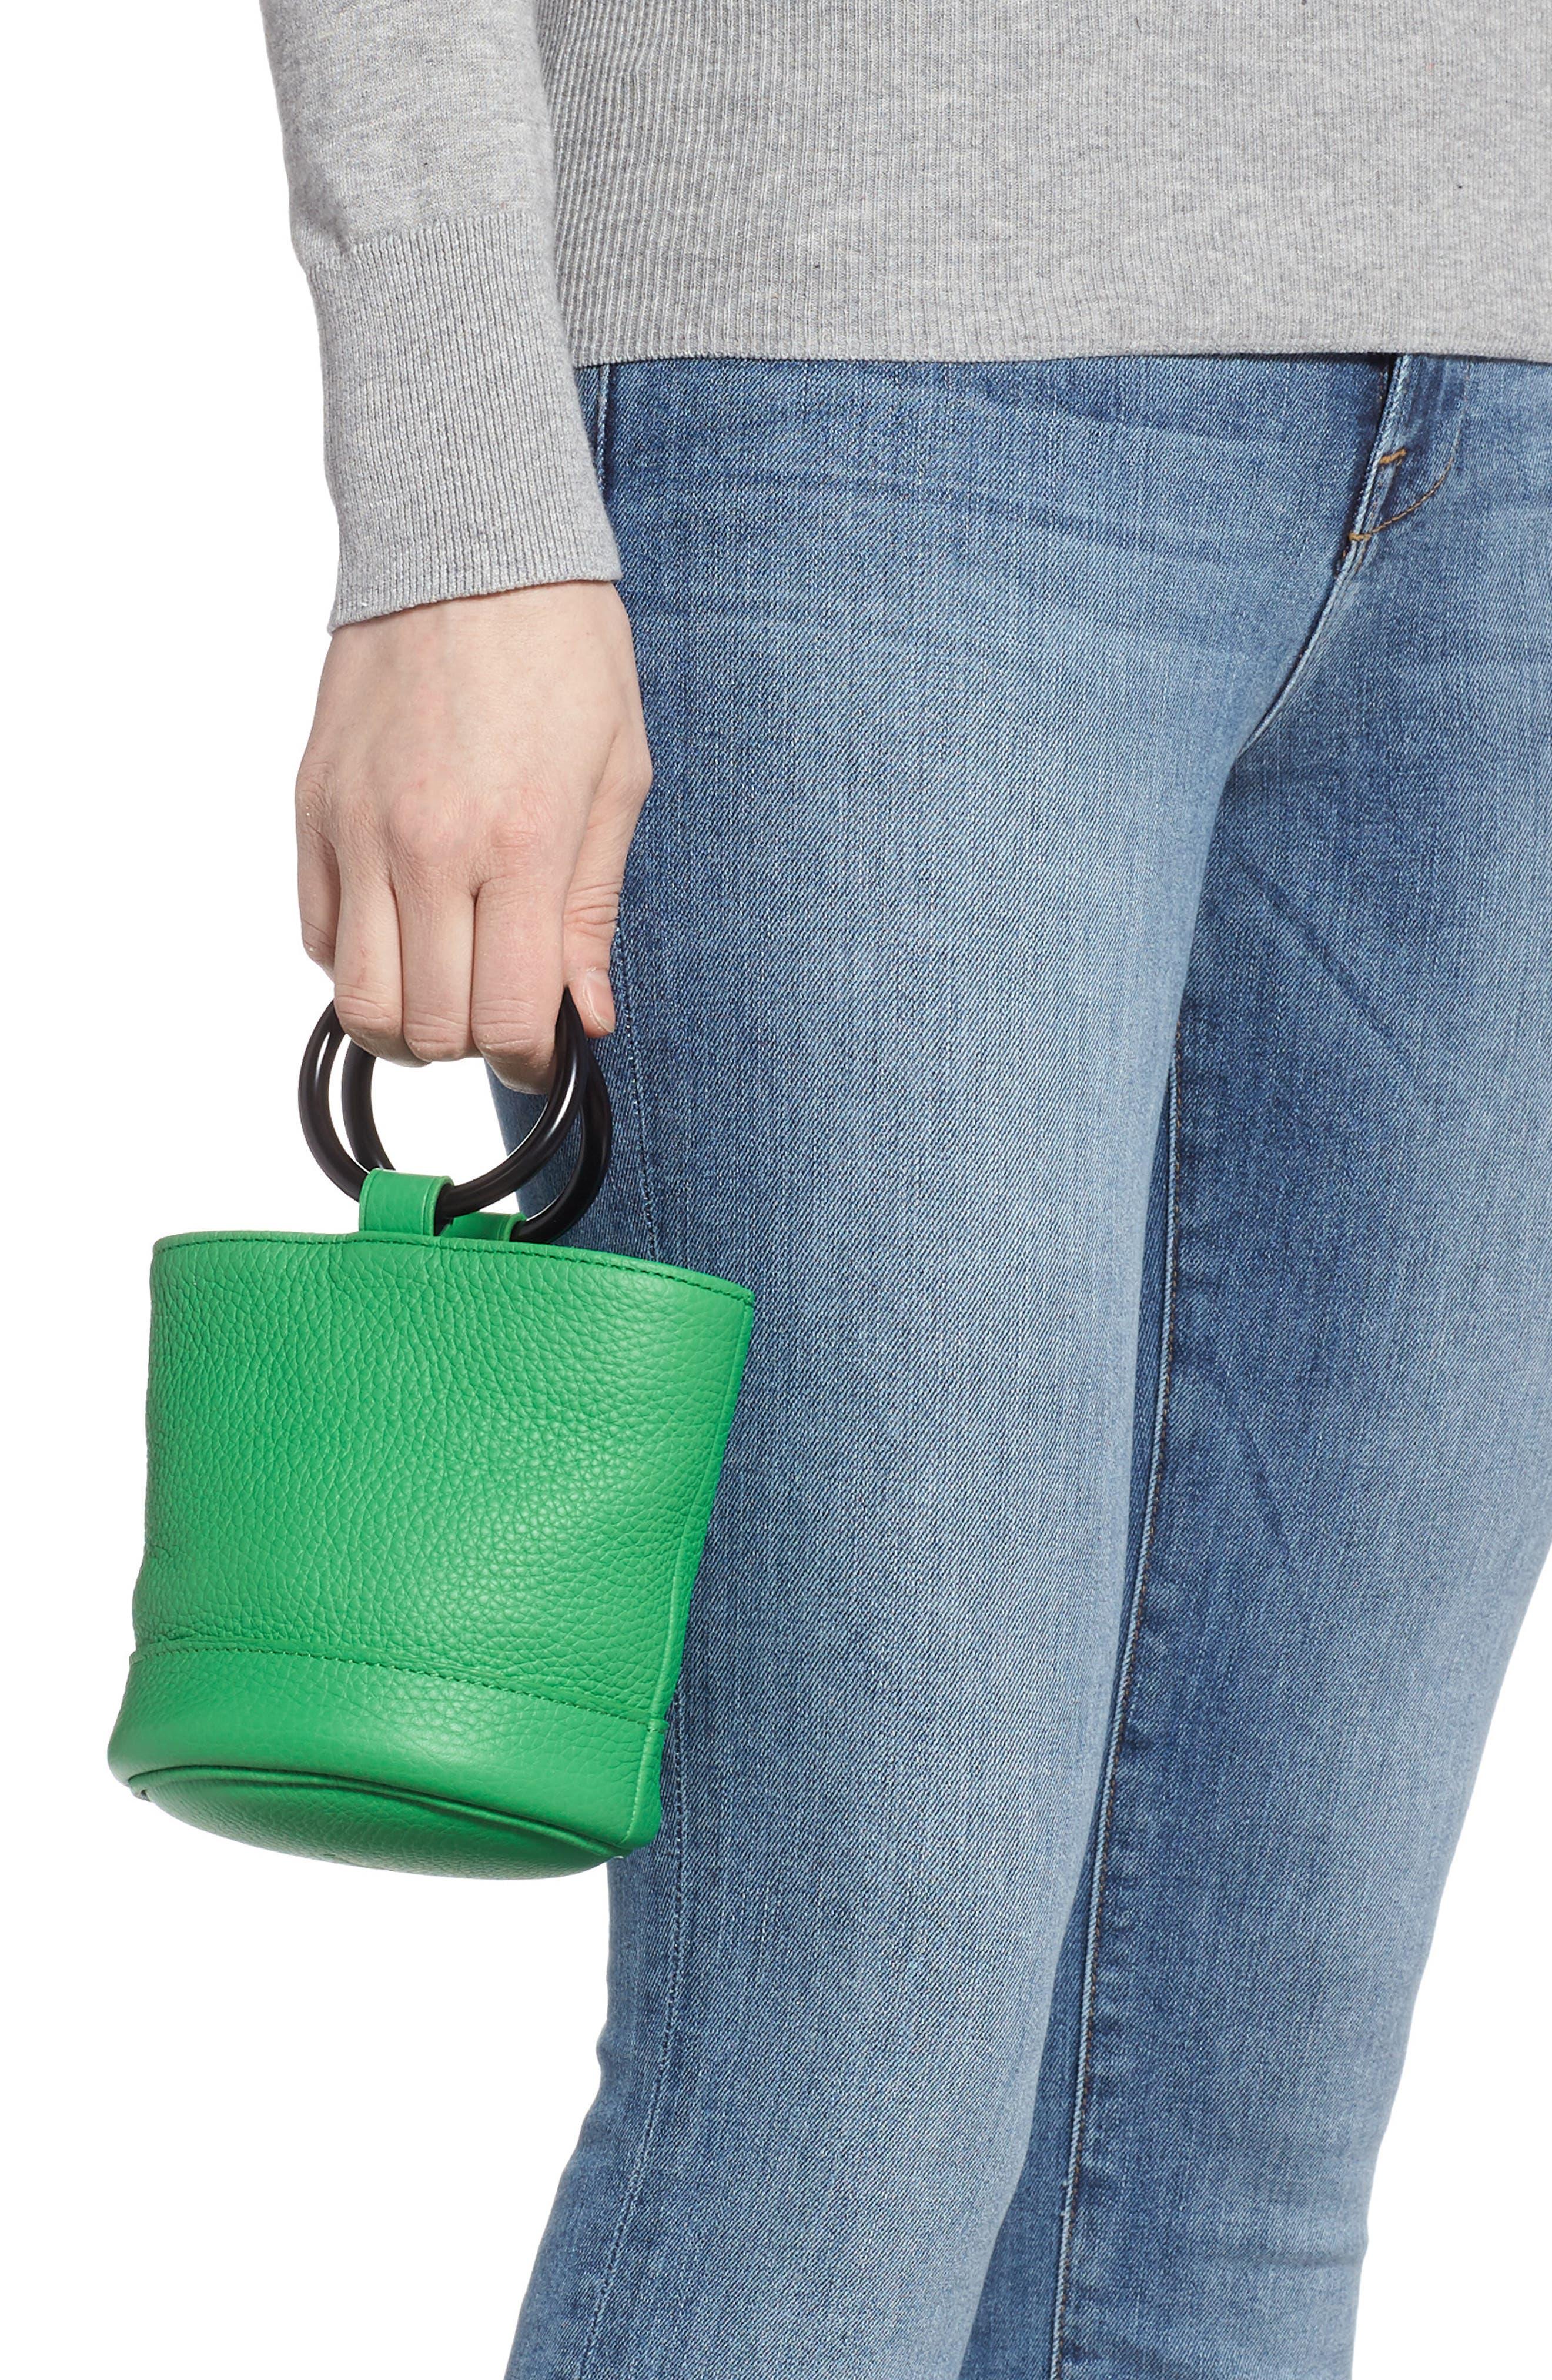 SIMON MILLER, Bonsai 15 Calfskin Leather Bucket Bag, Alternate thumbnail 2, color, NEON GREEN